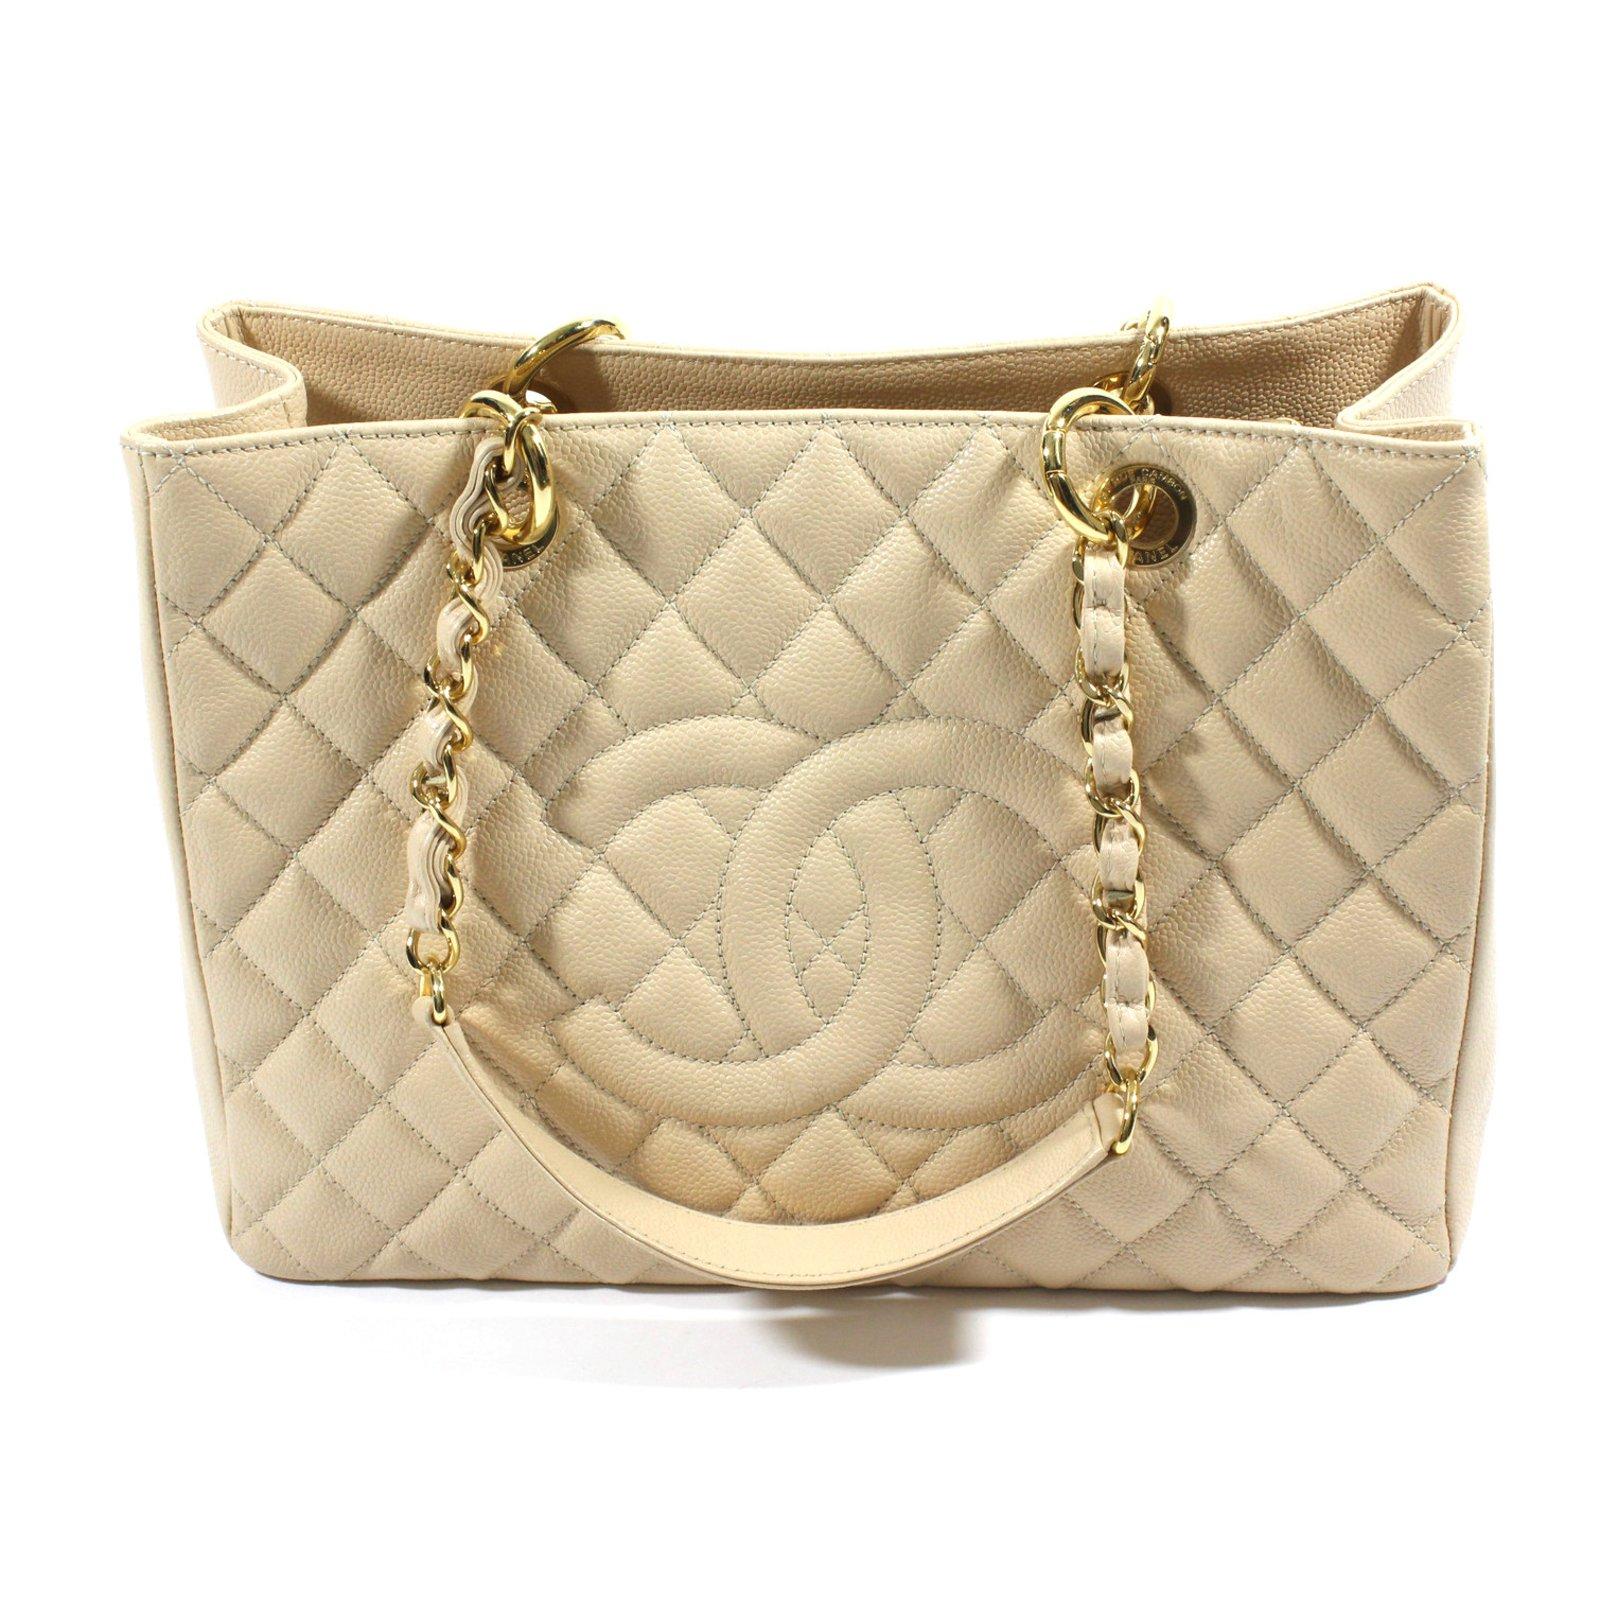 Chanel Shopping bag caviar Totes Leather Beige ref.18605 - Joli Closet